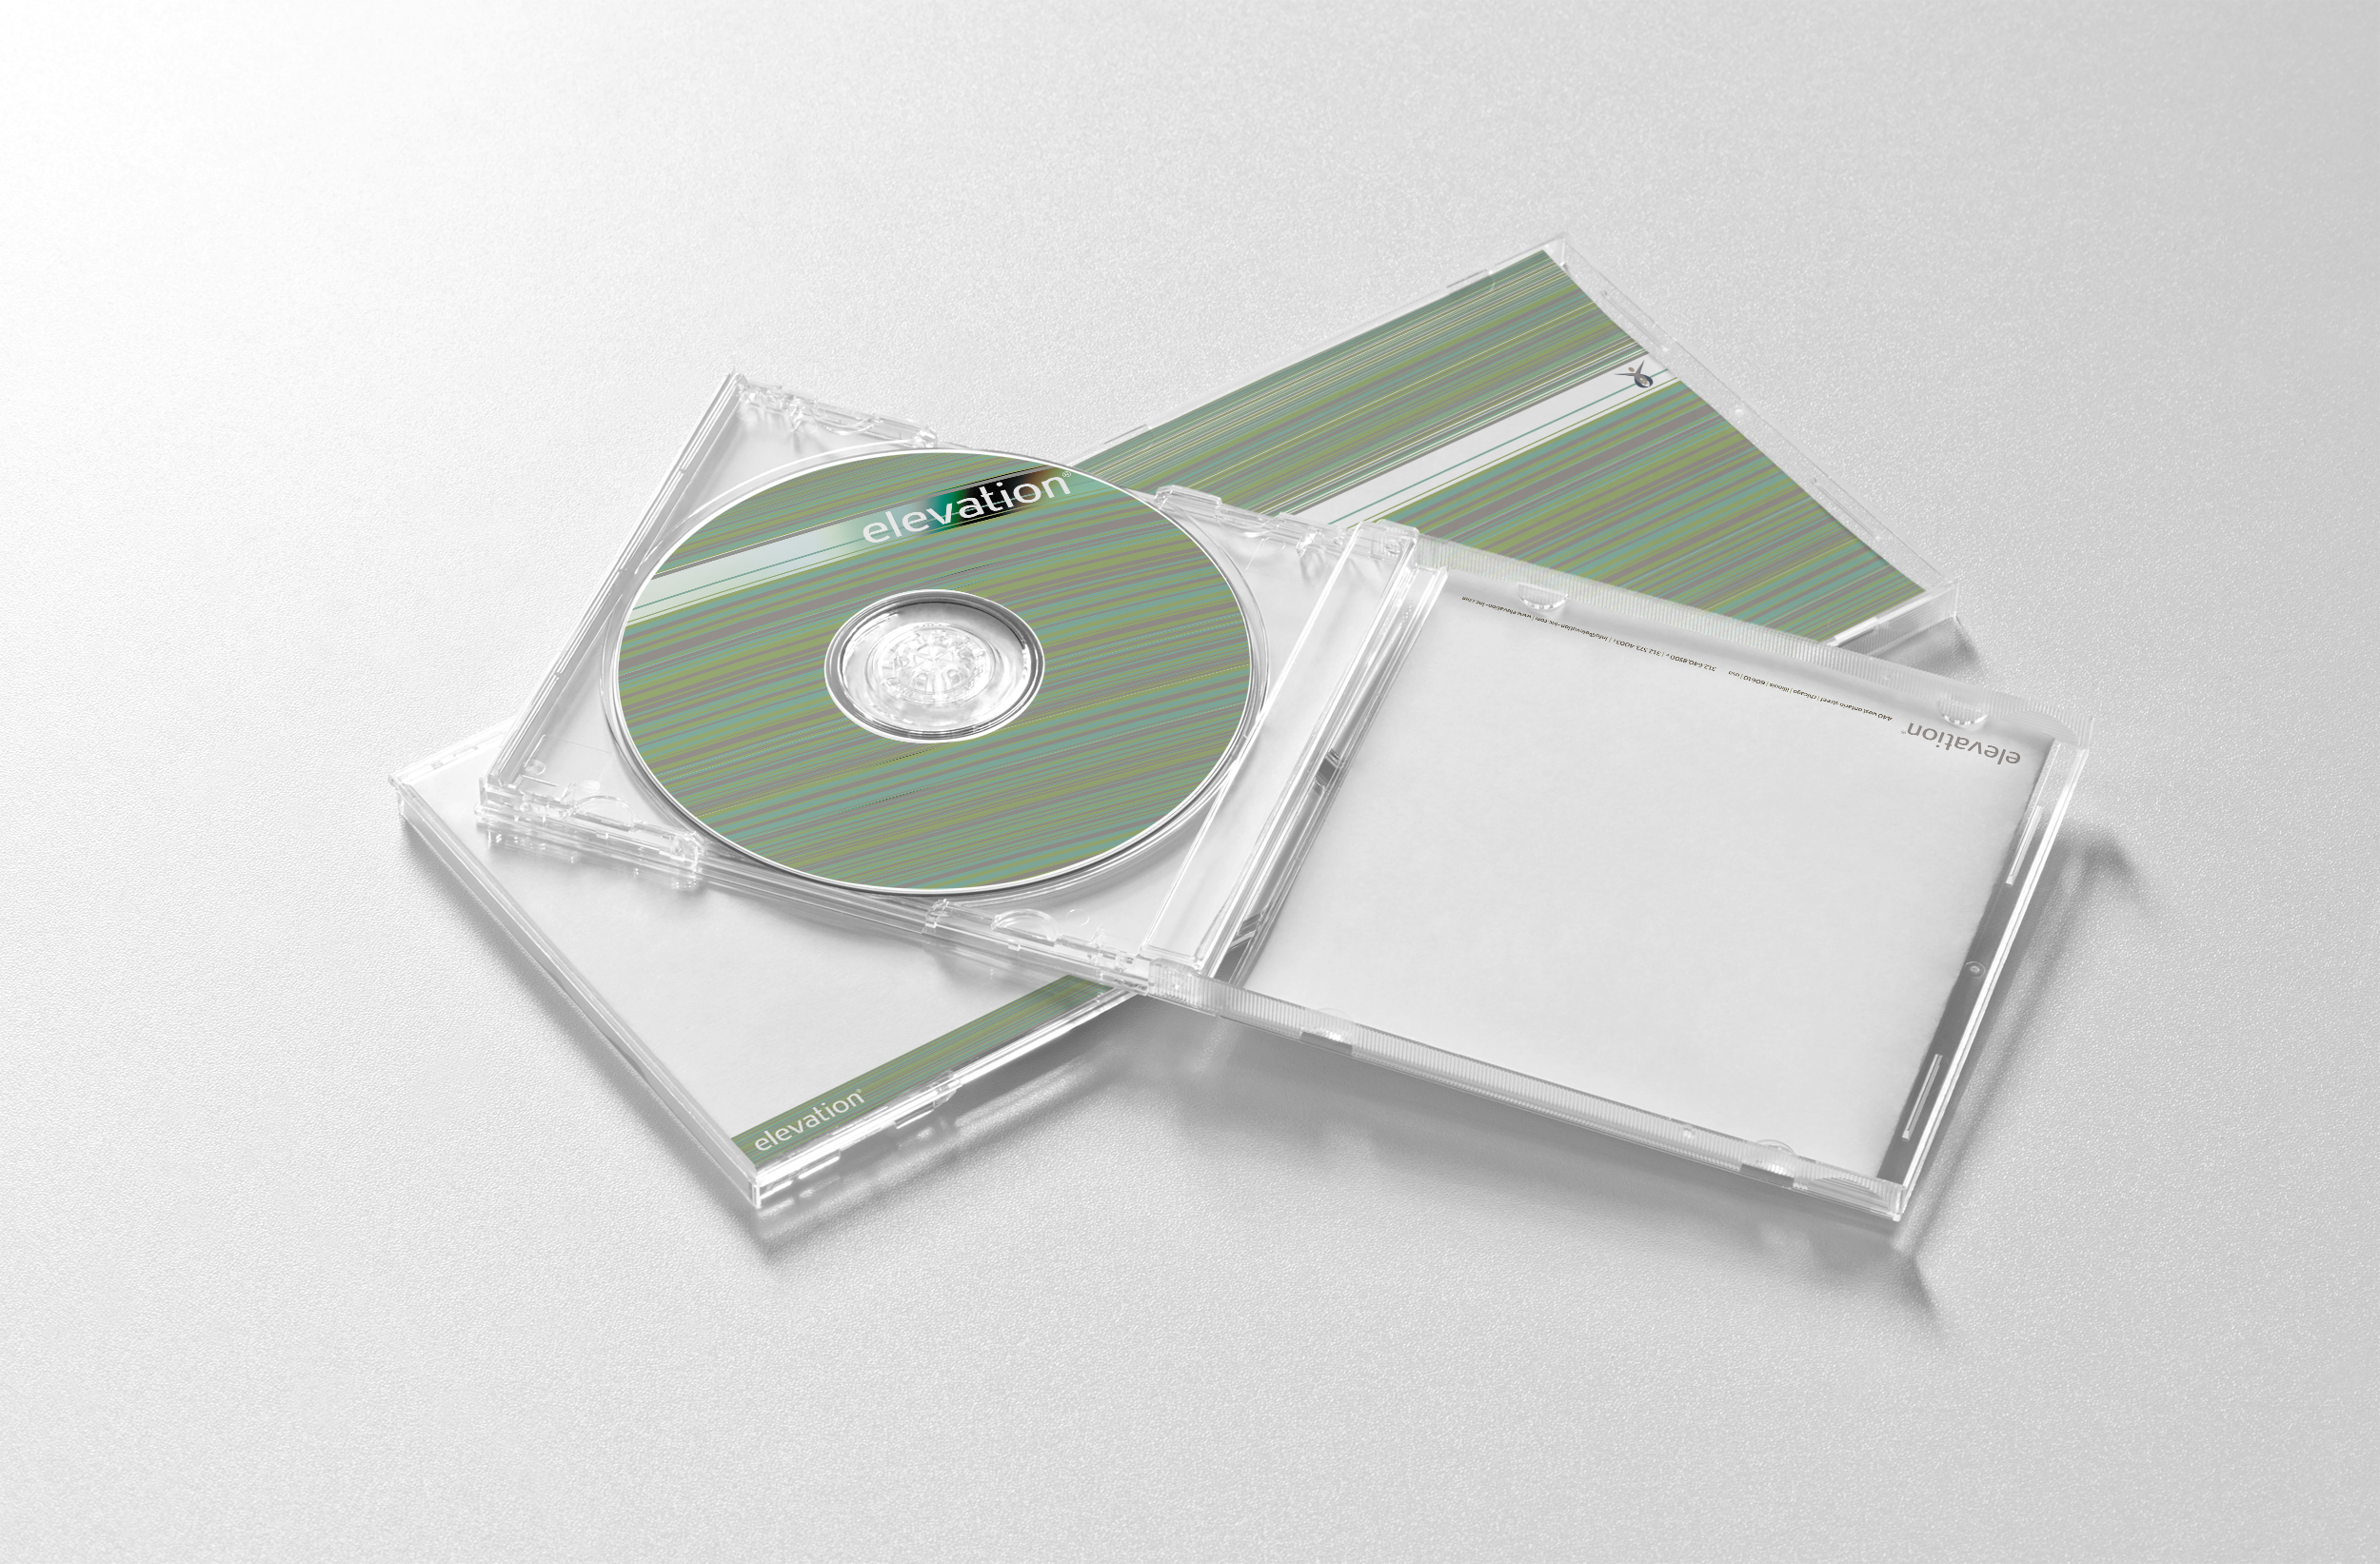 3D_elevation_cd-case.jpg